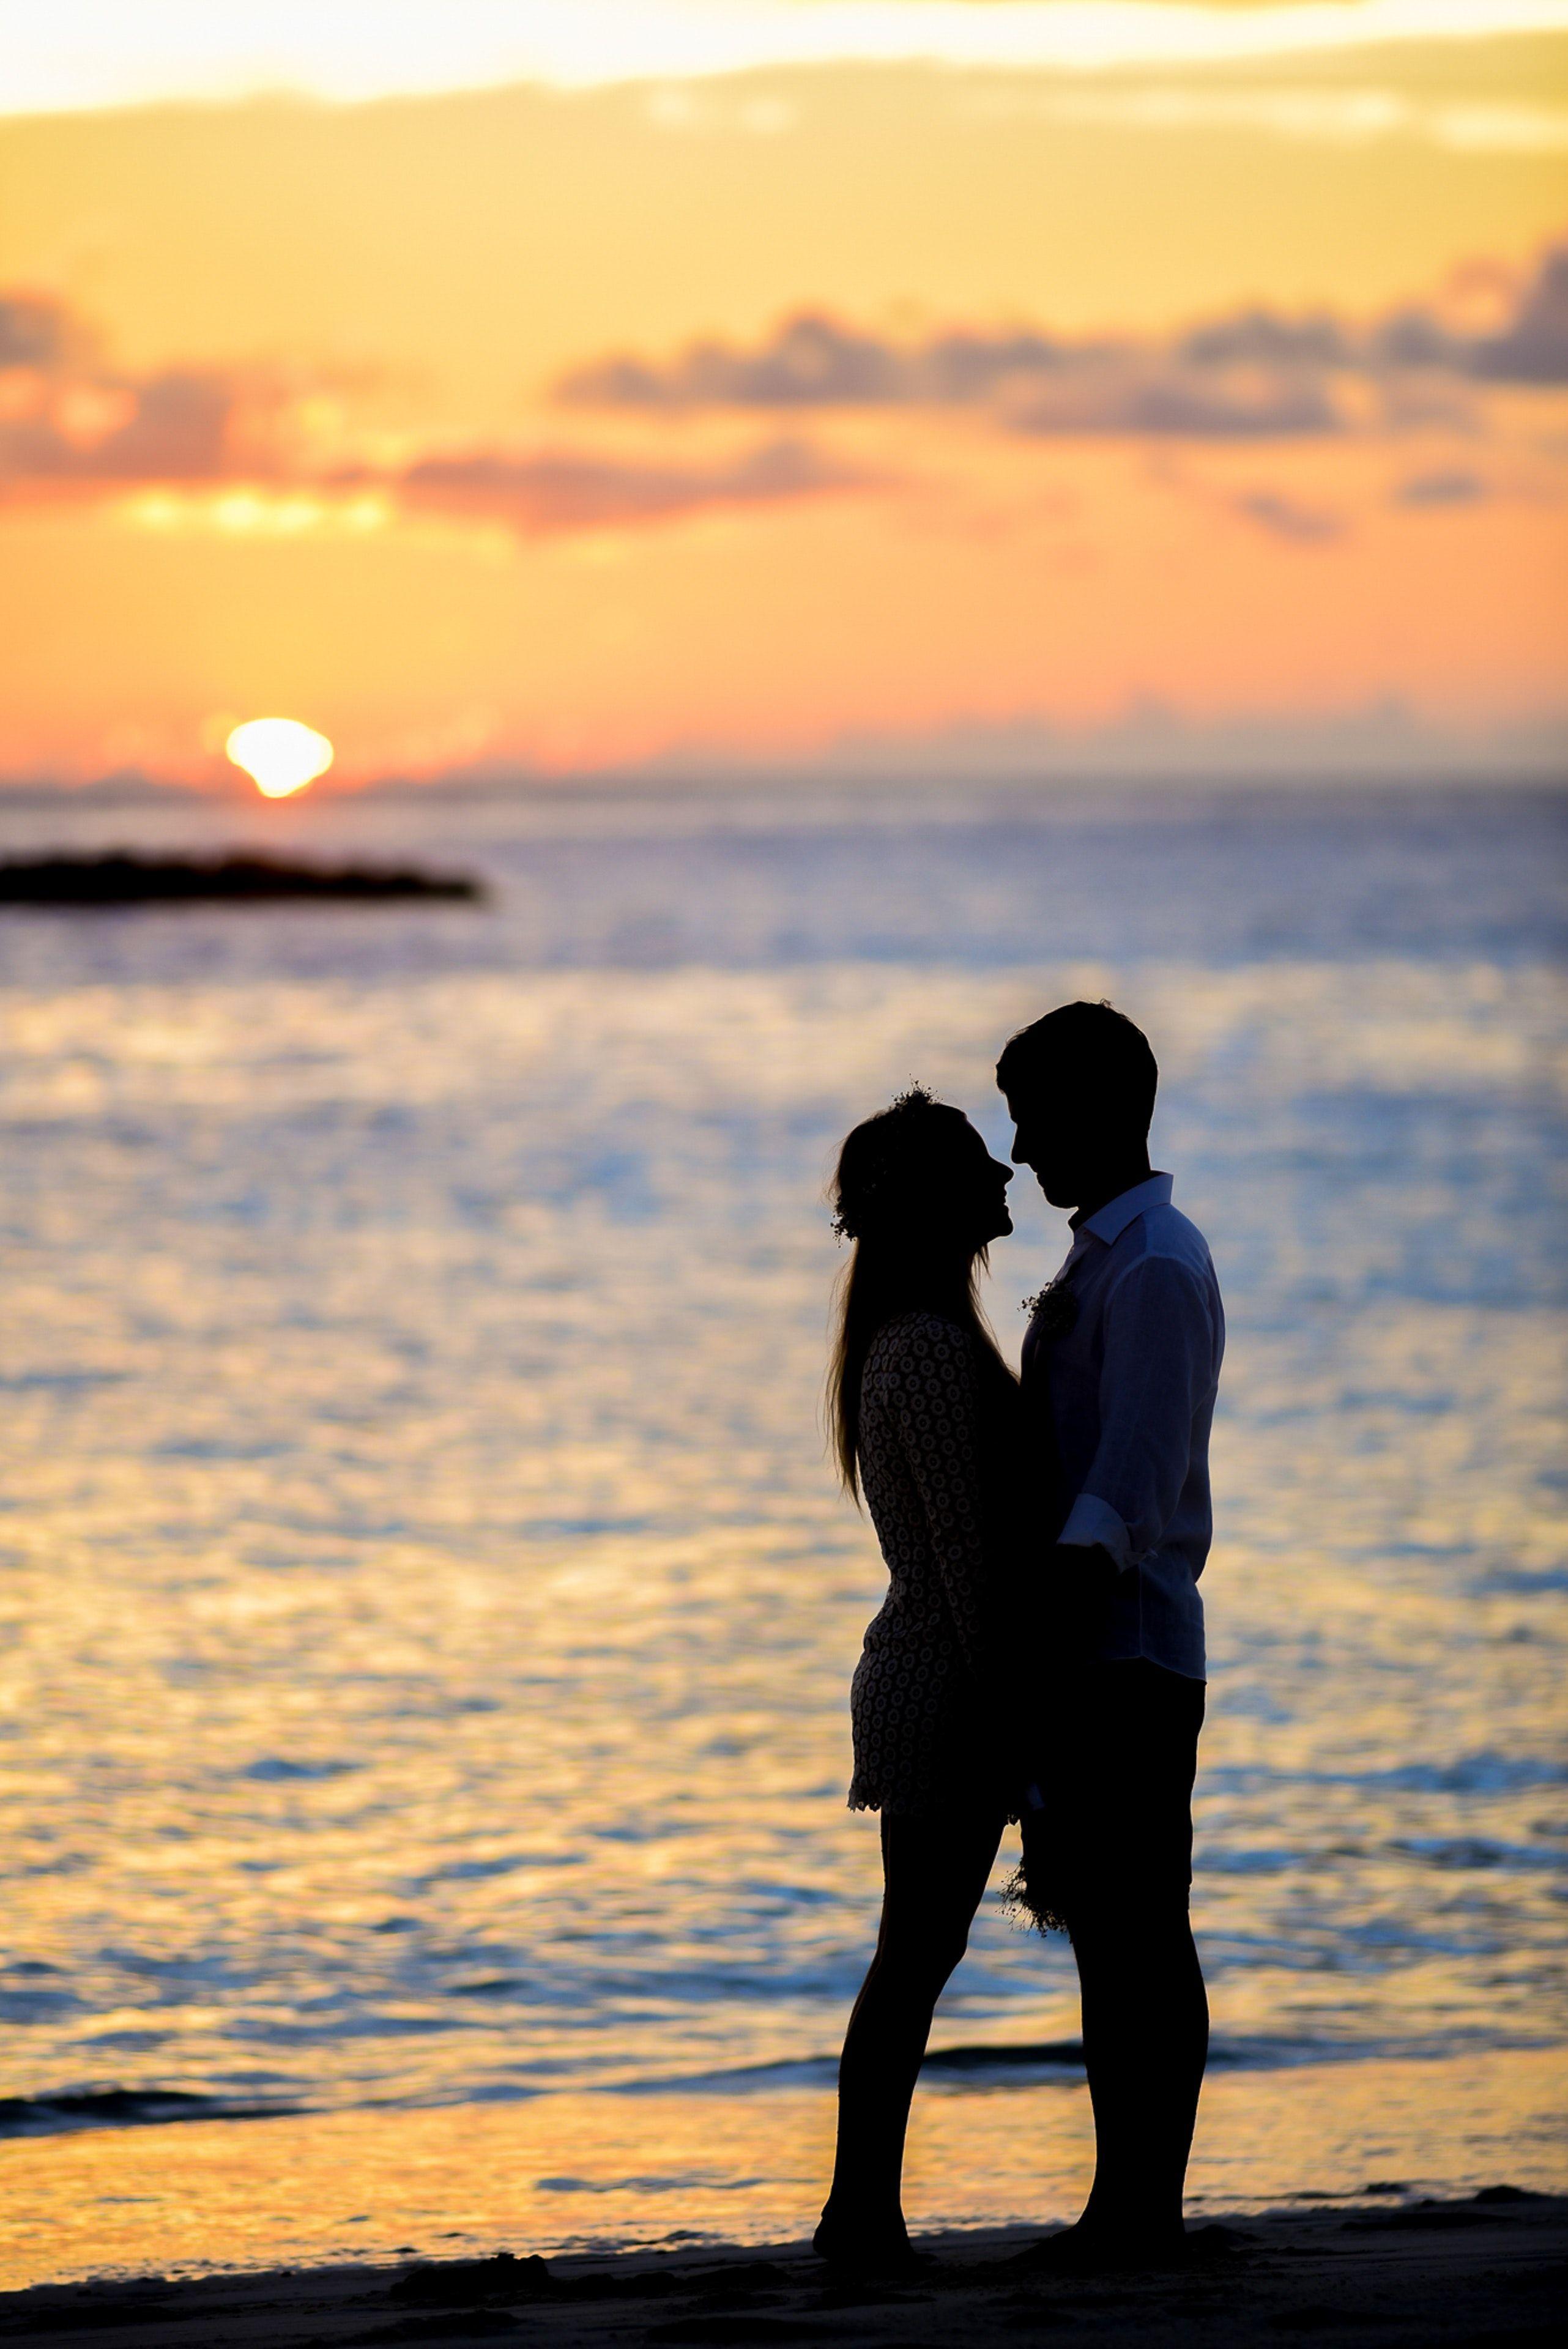 7 Tips To Find The Perfect Romantic Partner Dating Relationship Love Marriage Date Relation Girl Sevgi Resimleri Plaj Dugunu Fotograflari Romantik Ciftler